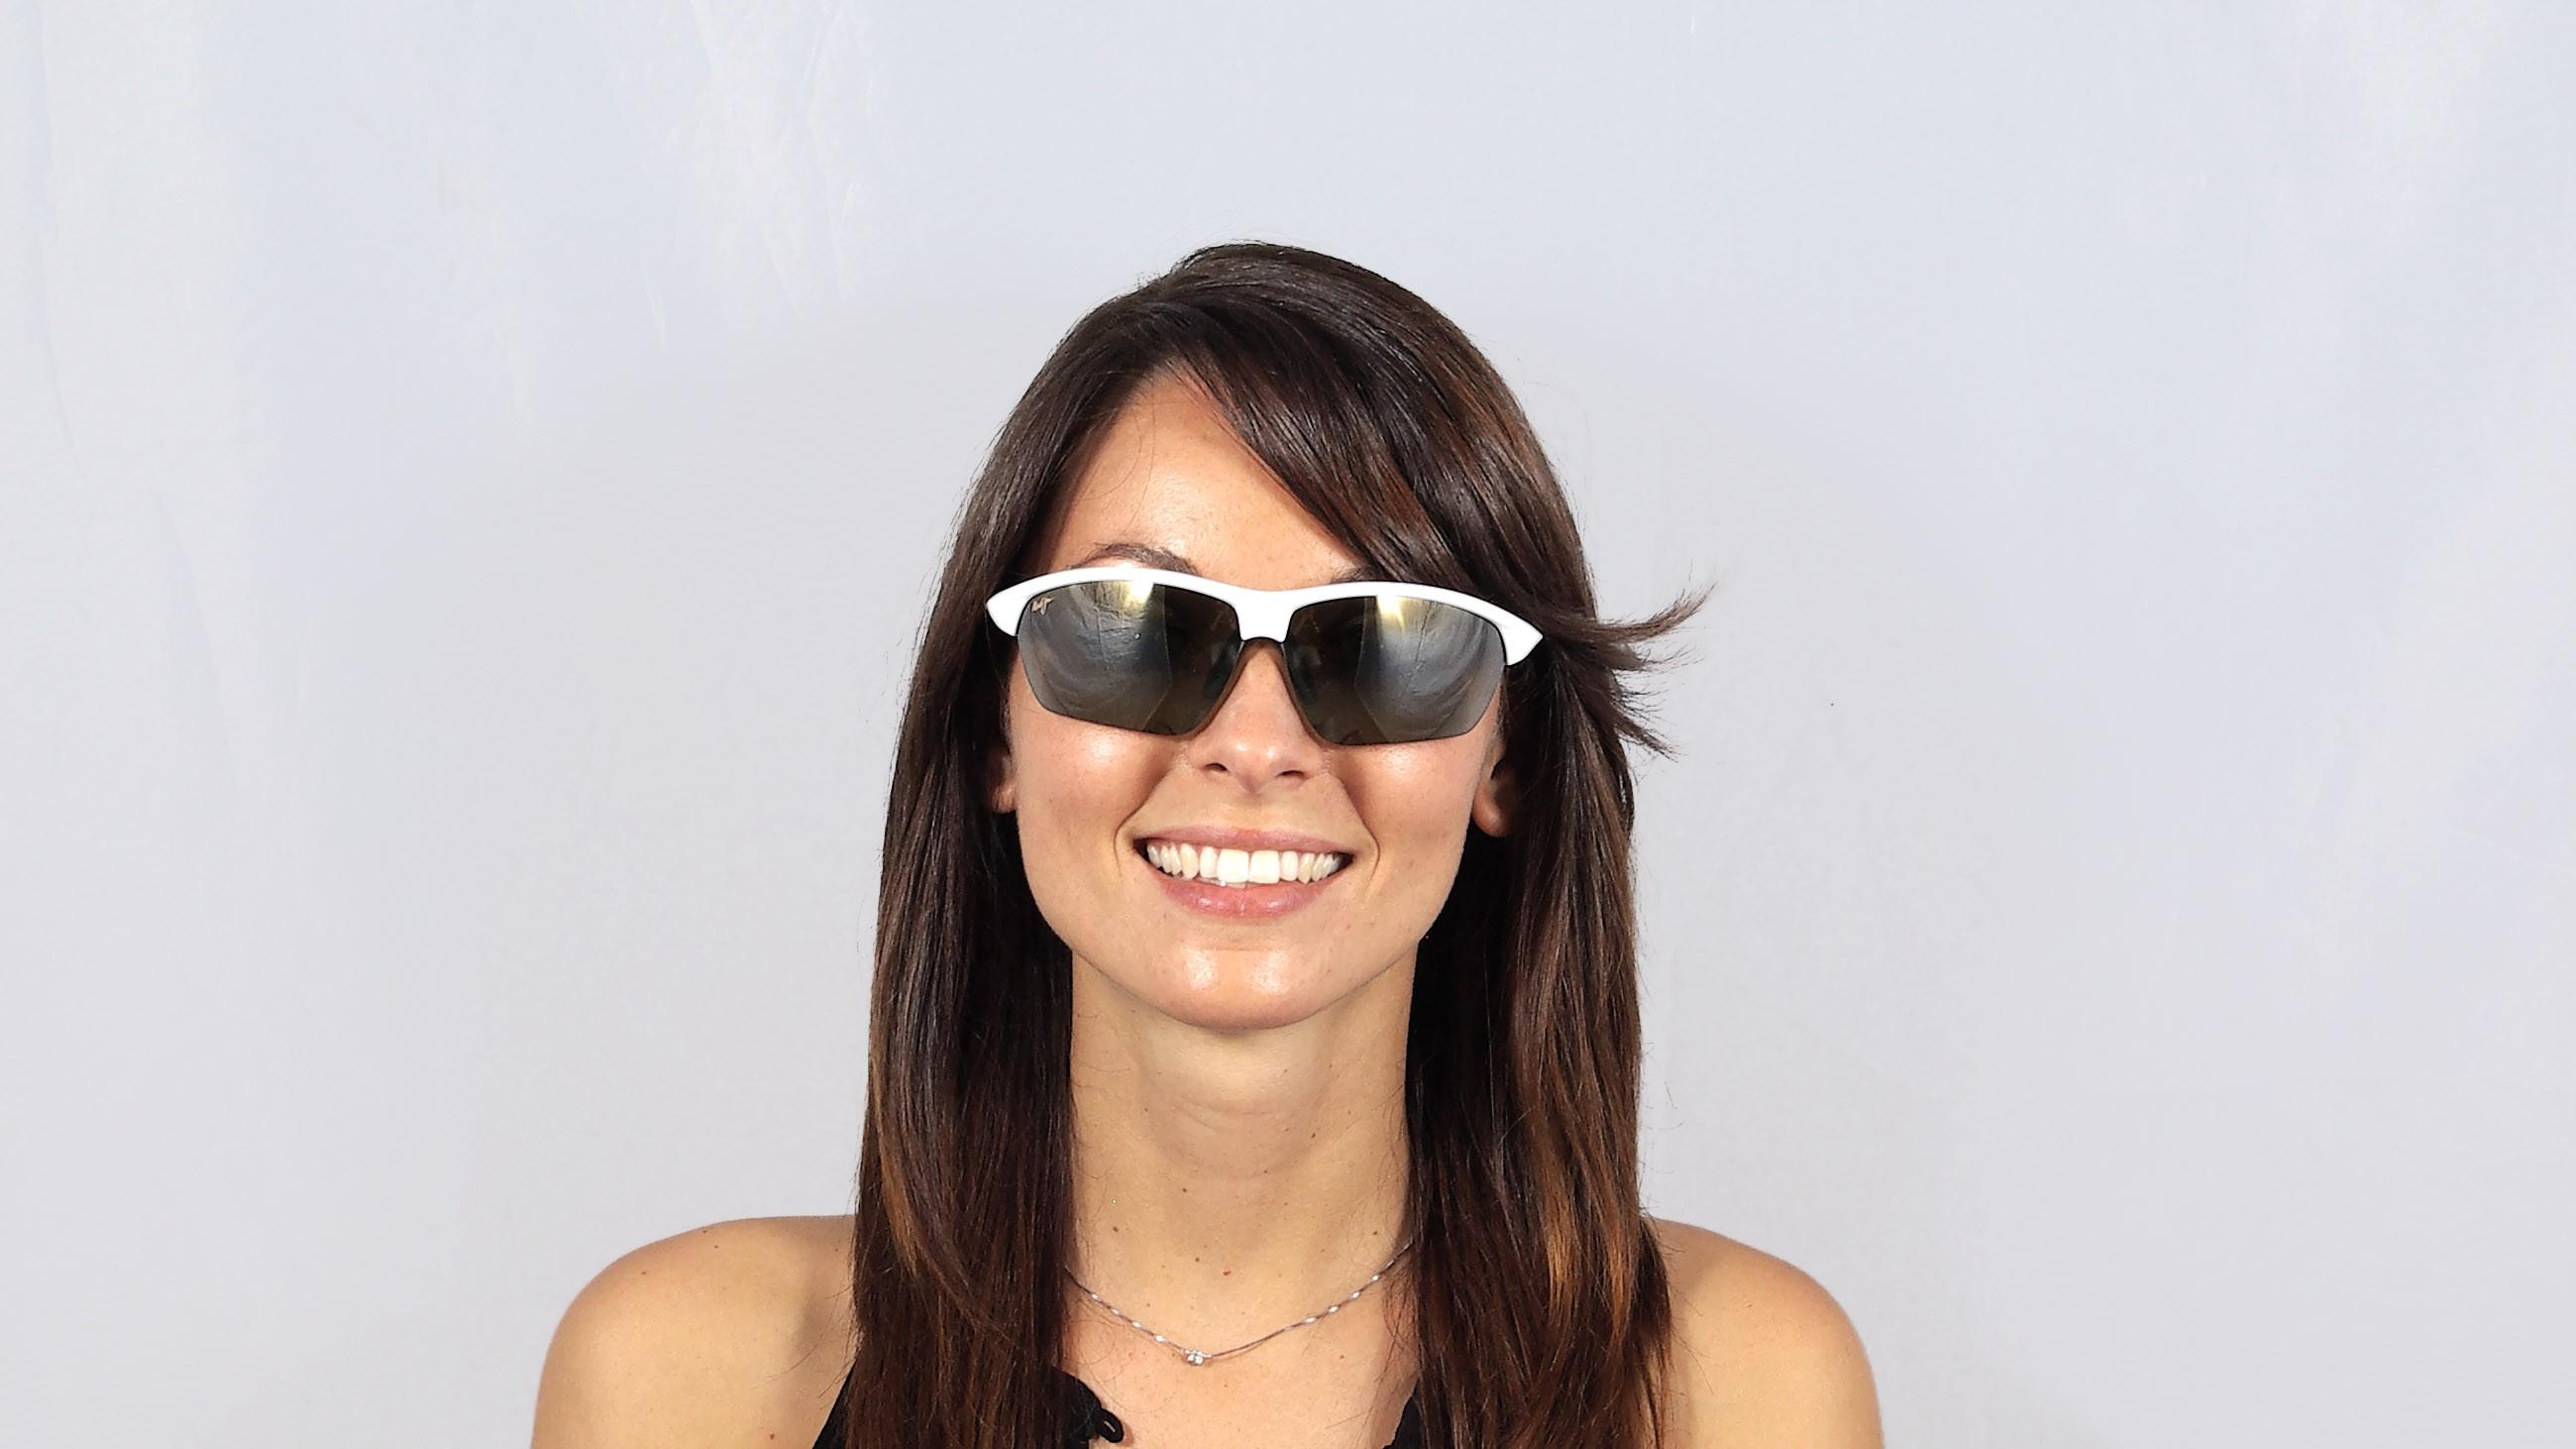 Sunglasses Maui Jim Stone Crusher White HT429-05 71-17 Large Polarized